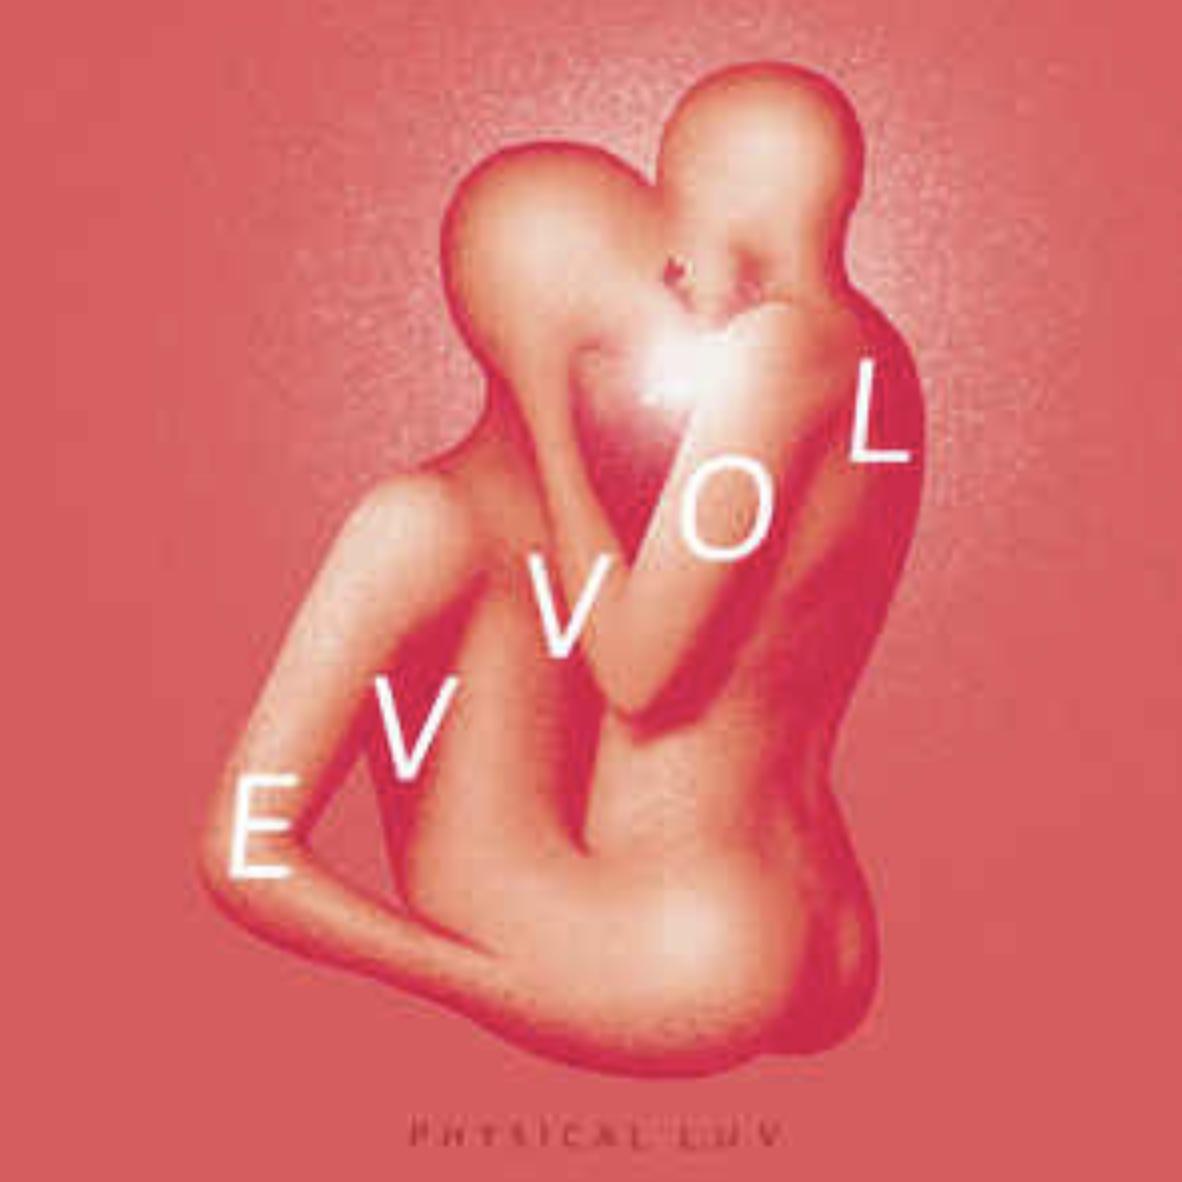 Evvol Physical L.U.V EP  co-writer/producer/record engineer/mixer